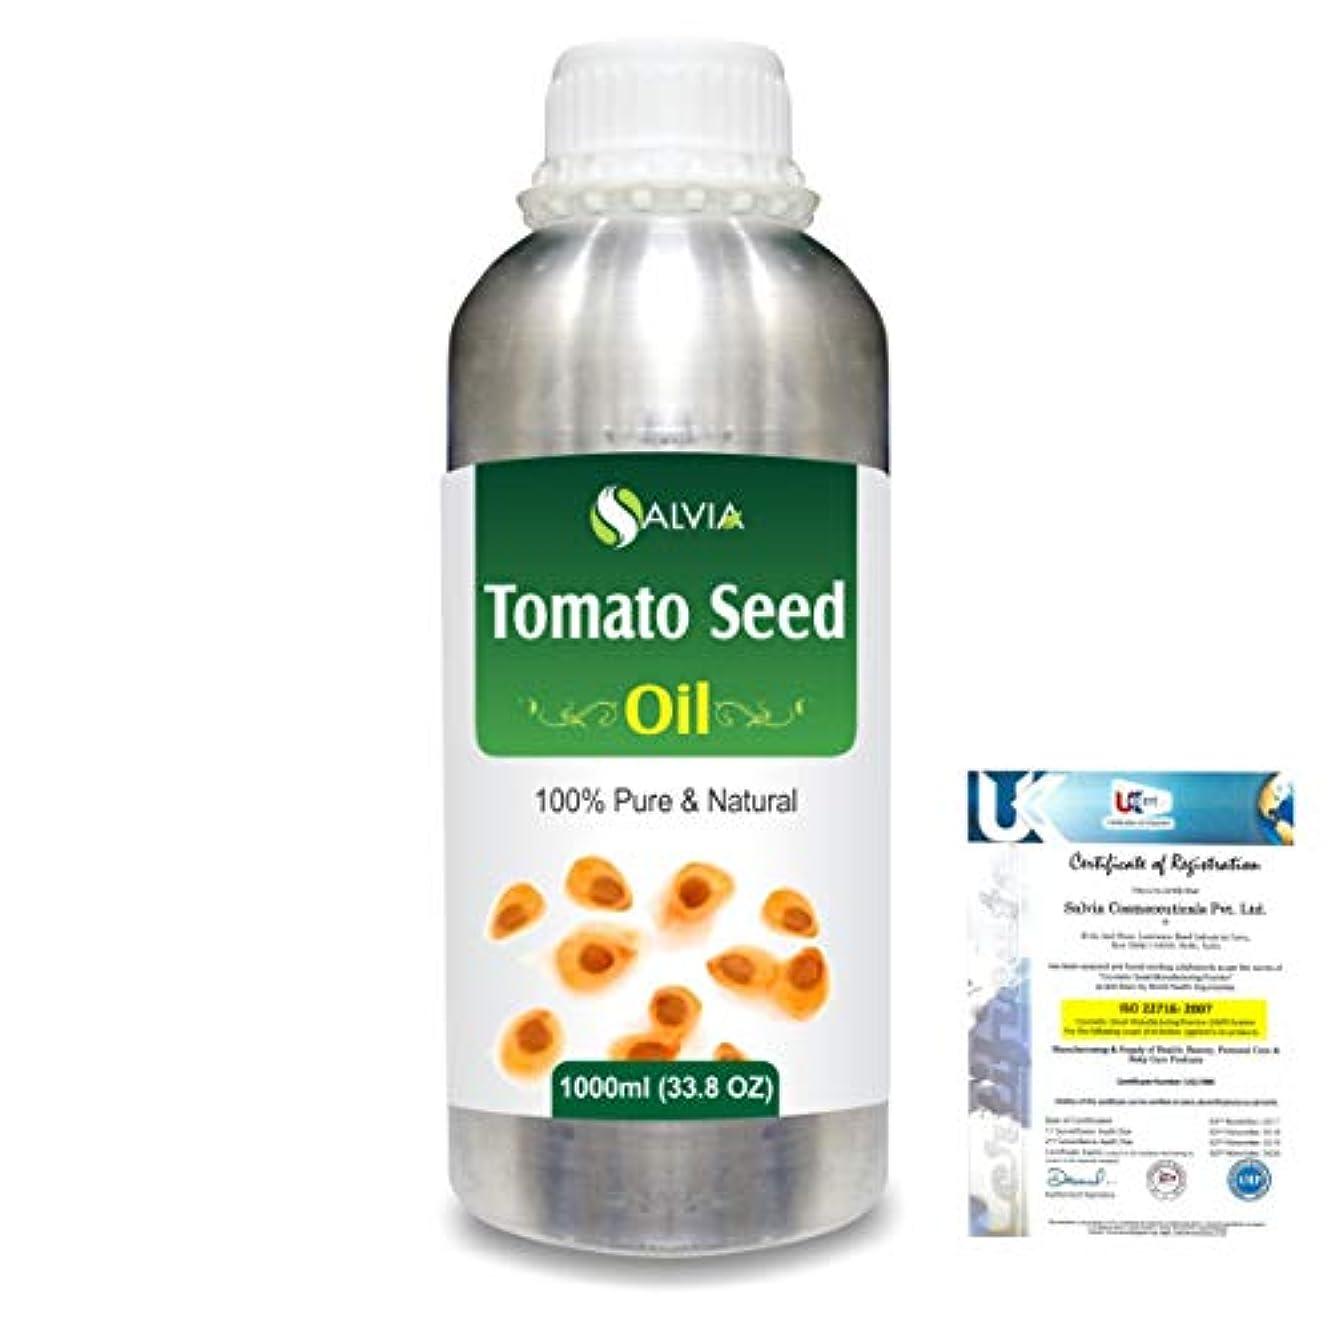 Tomato Seed (Lycopersicon Esculentum) 100% Pure Natural Carrier Oil 1000ml/33.8fl.oz.